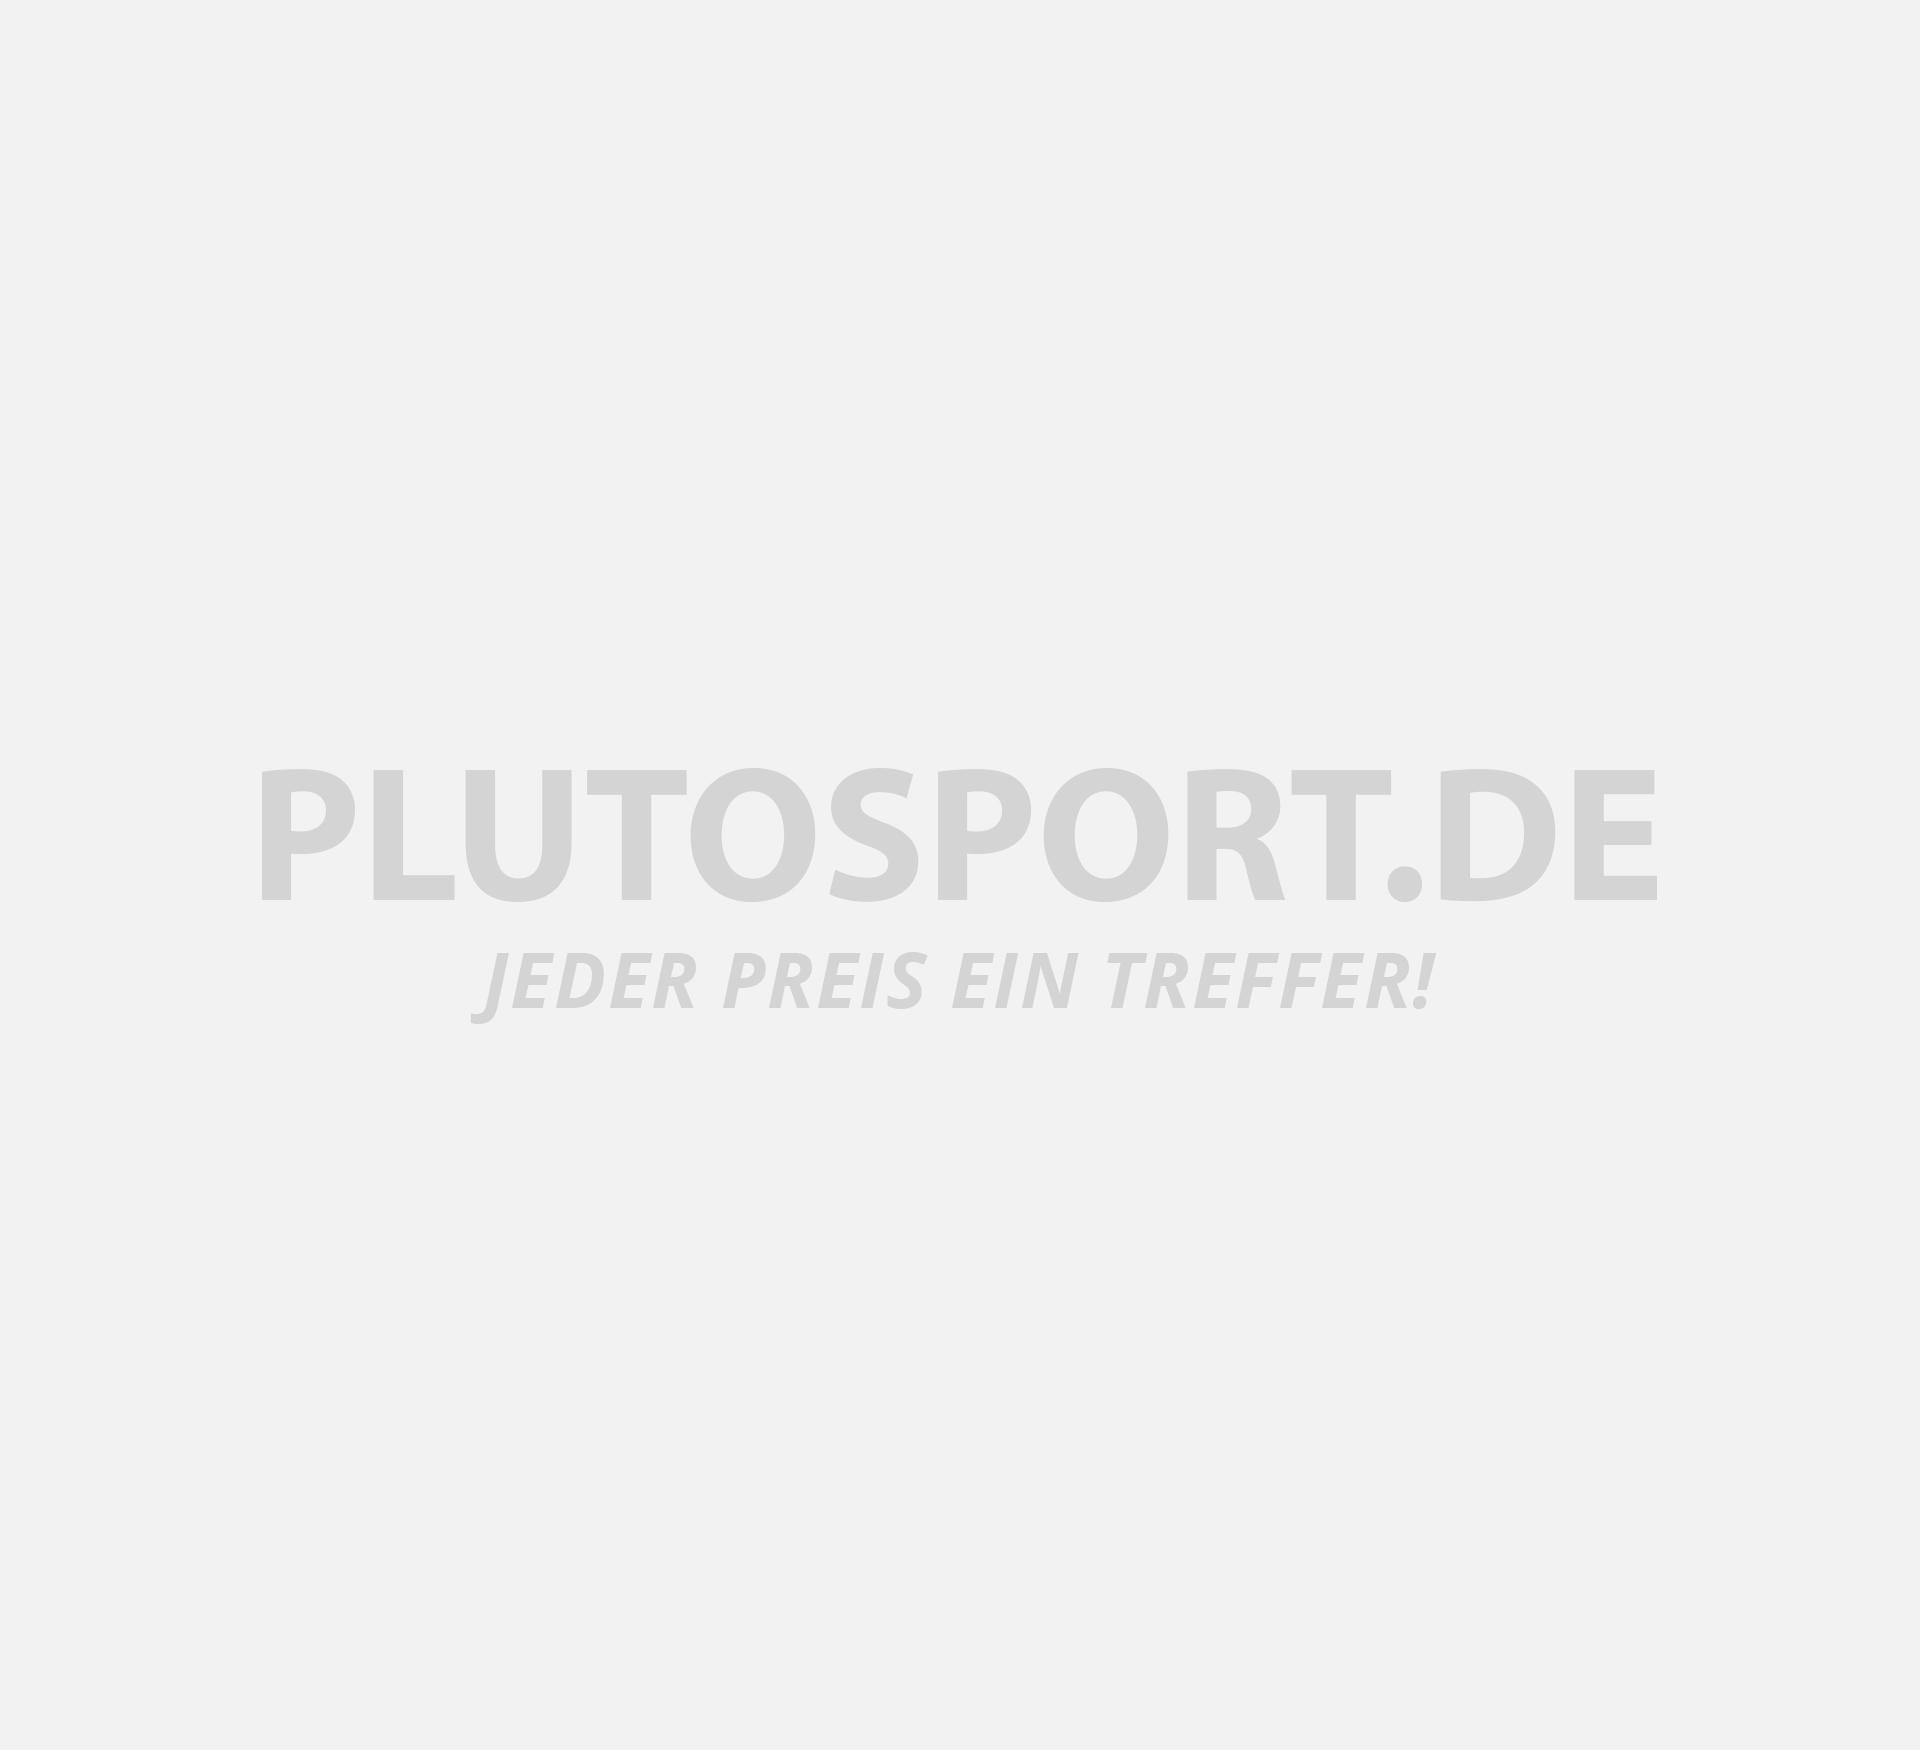 Columbia Classic Outdoor Pack (25L) - Rucksäcke - Taschen - Freizeit - Herren | Plutosport